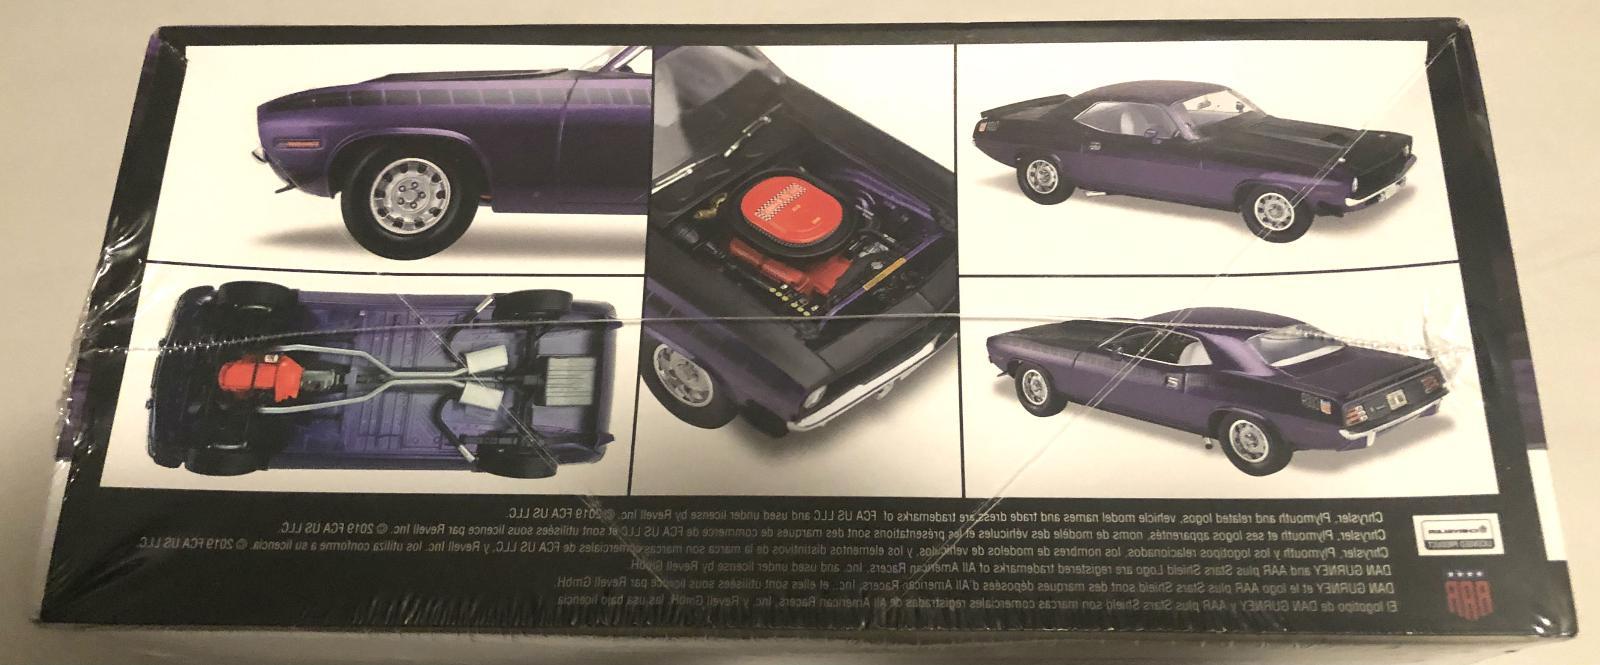 Revell Plymouth Cuda model car